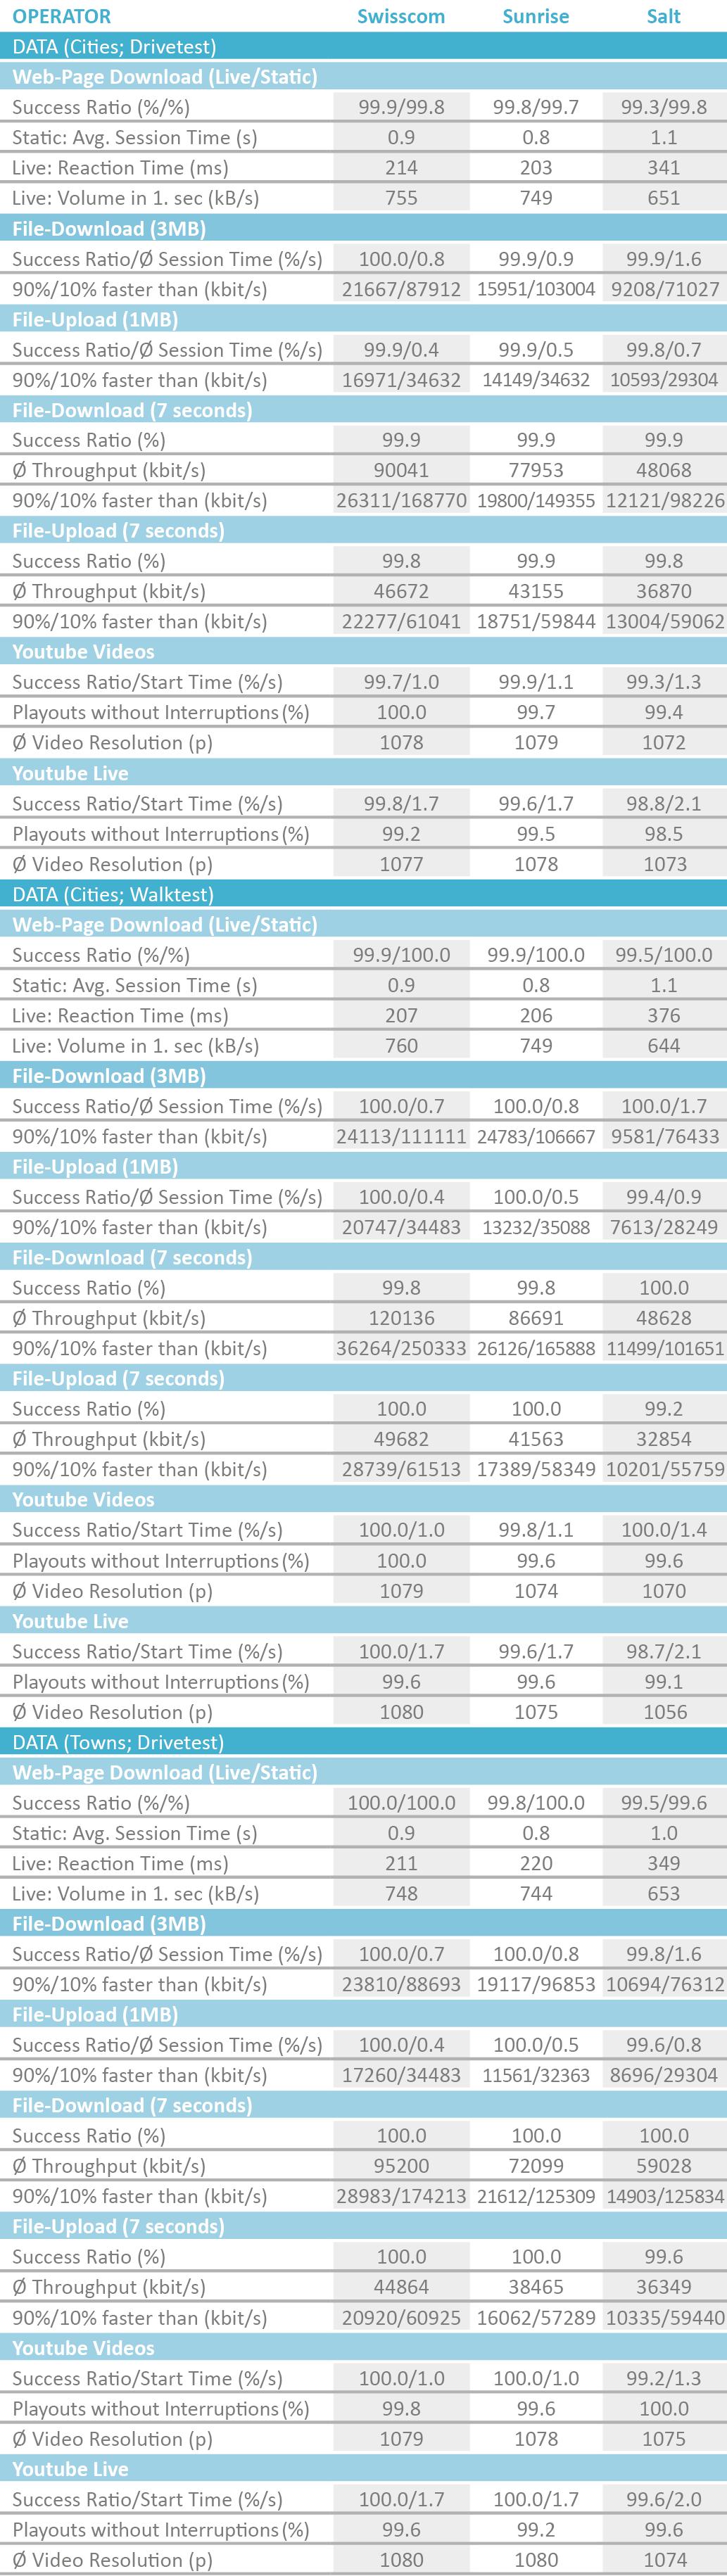 CH_Tabelle_DatenCitiesDriveWalk2019_englisch.png